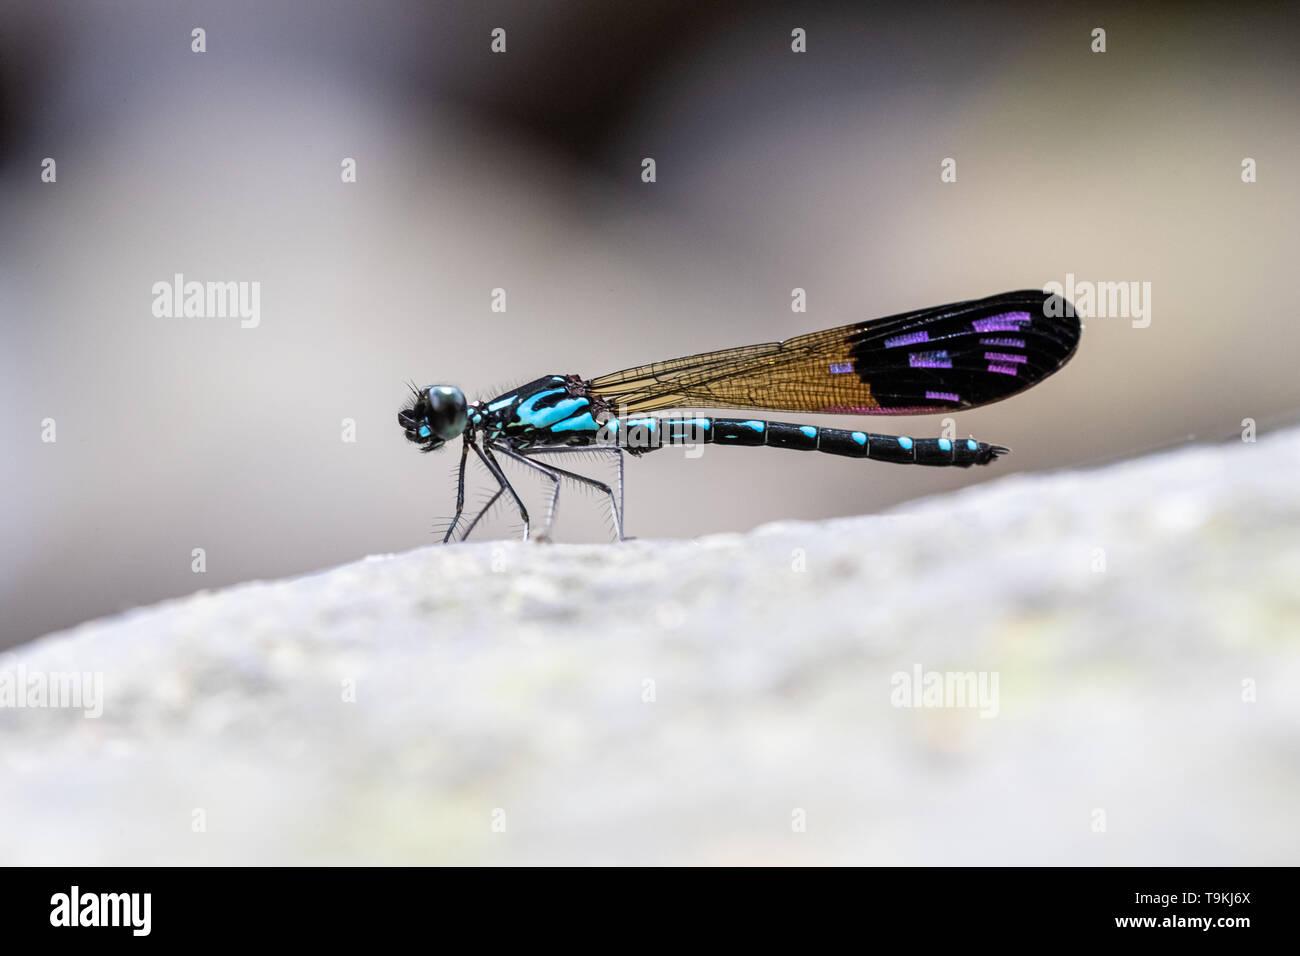 Portrait of damselfly - Common Blue Jewel (Rhinocypha perforata perforata) - Stock Image